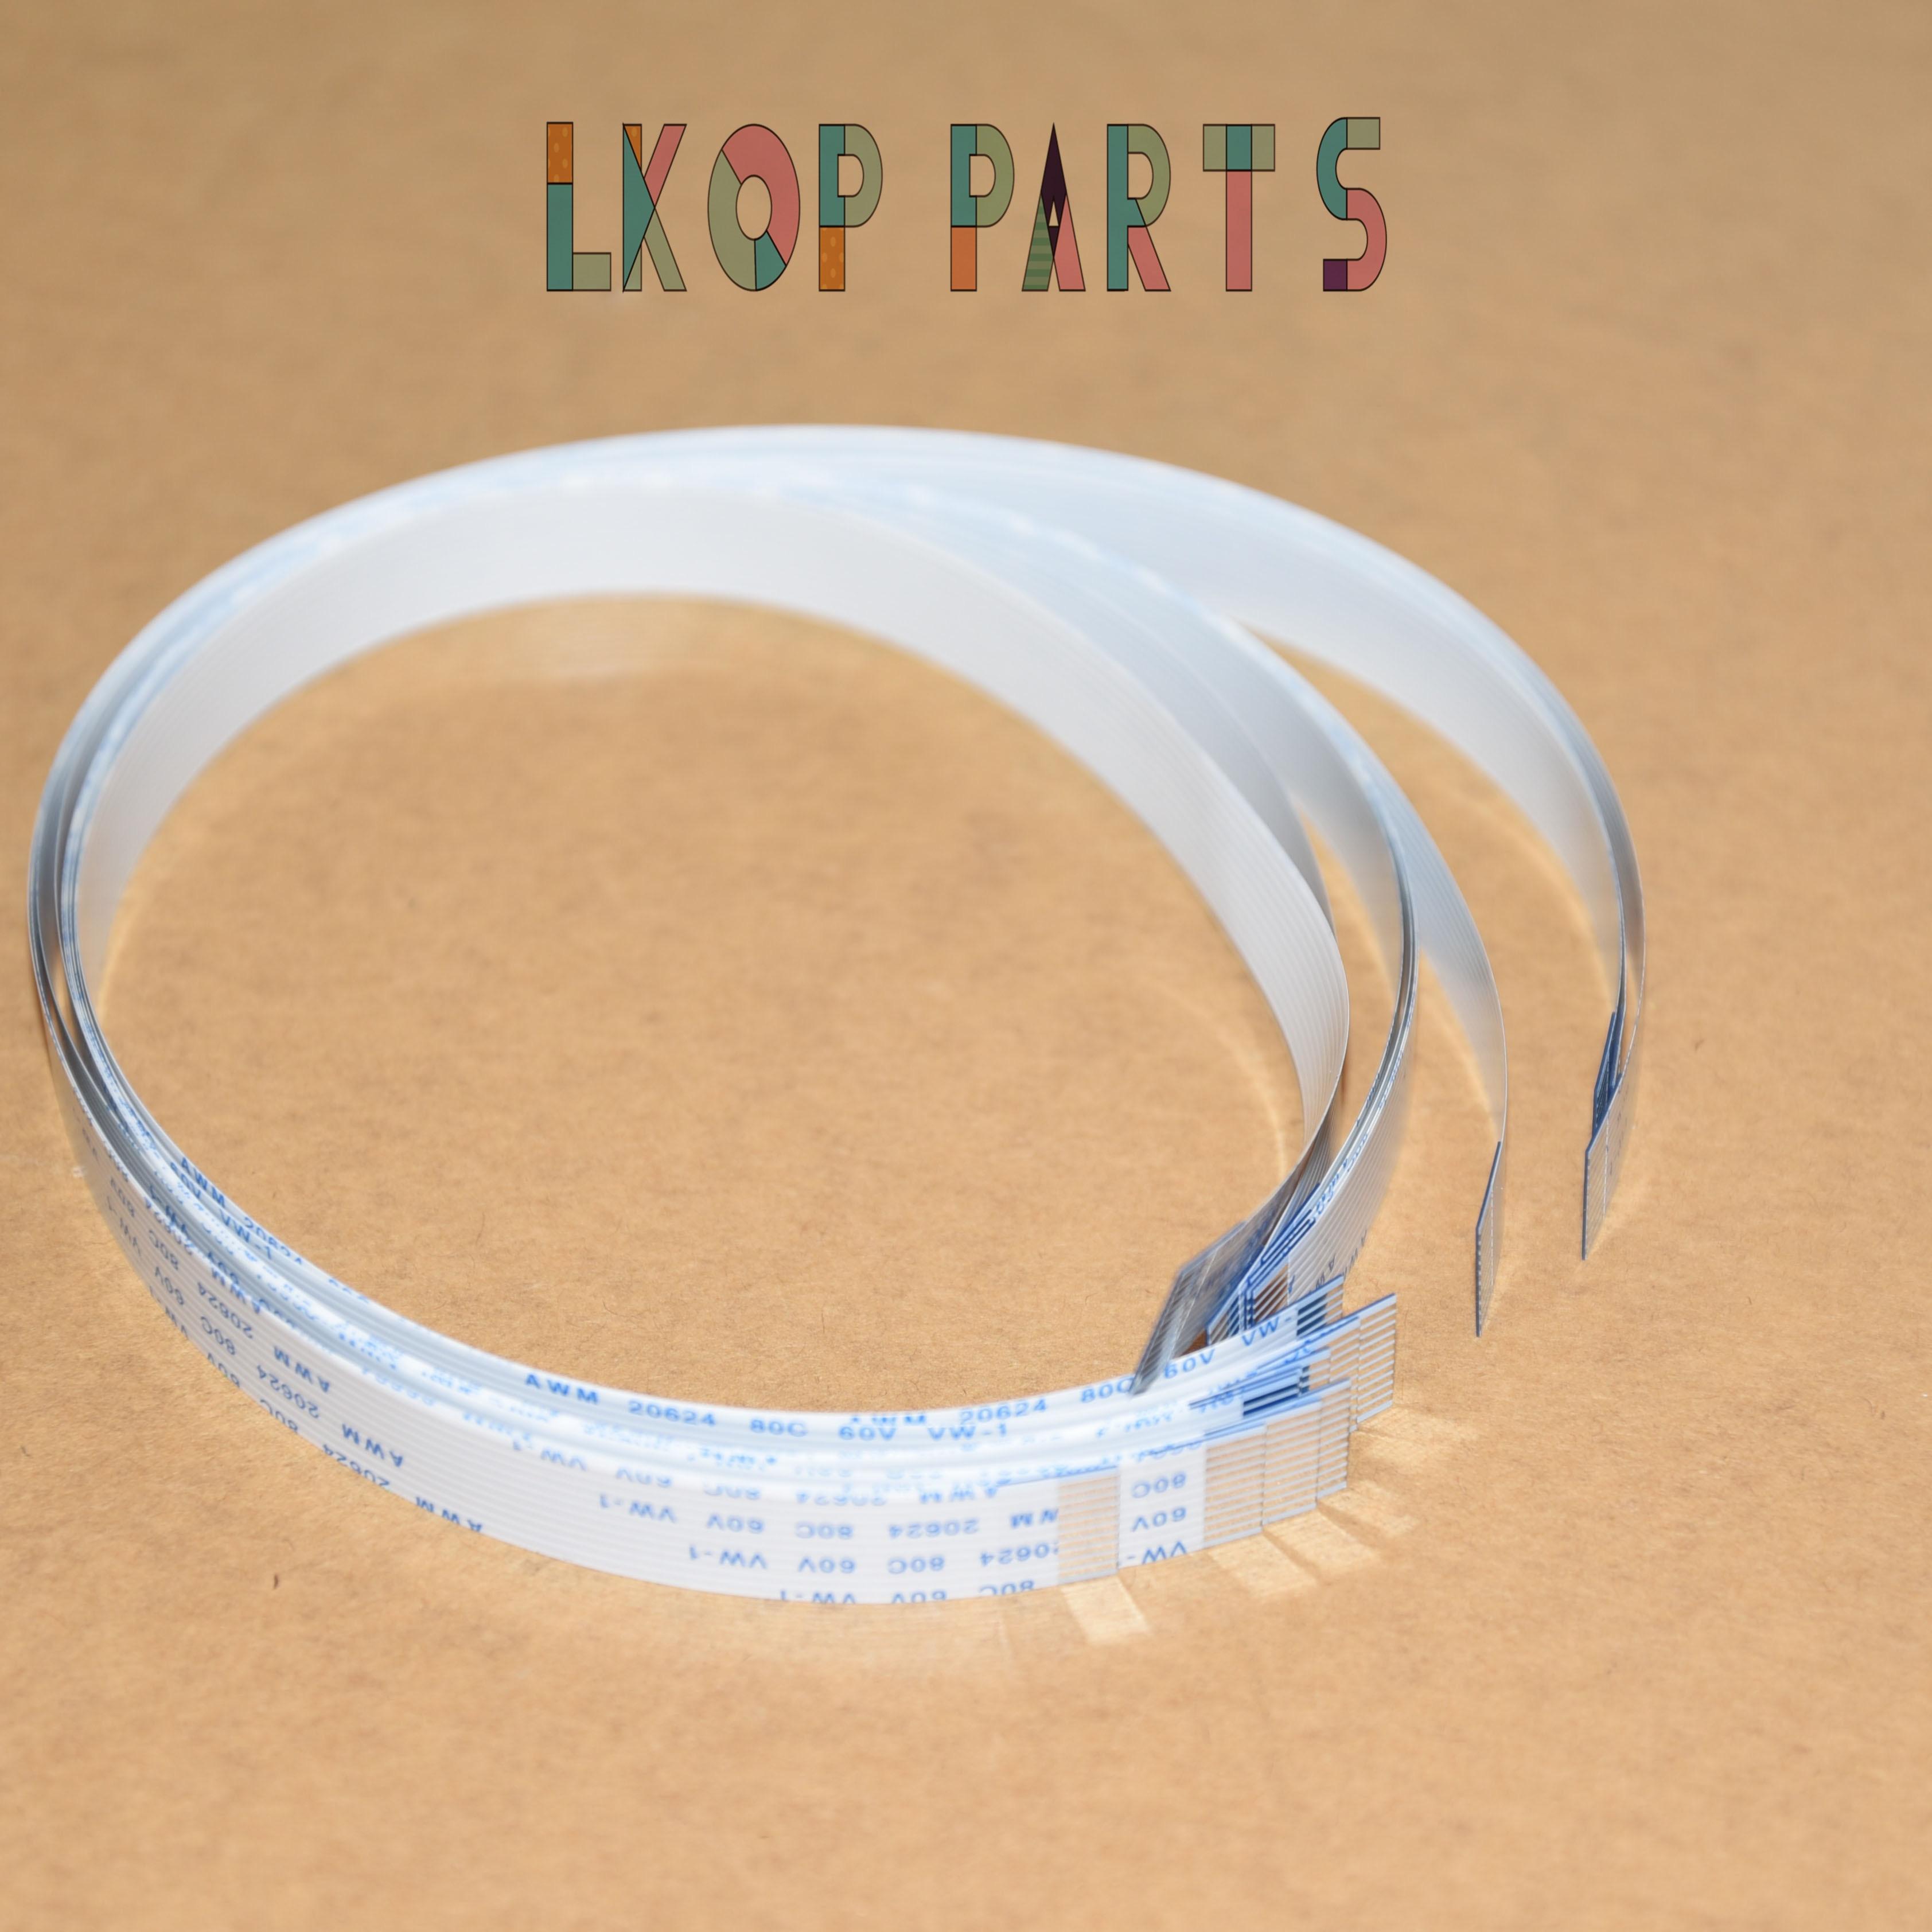 10pcs Automatic Doc Feeder ADF Flat Flex flexible Cable 10PIN 46CM for HP M426 M427 M274 M277 M377 M477 M452